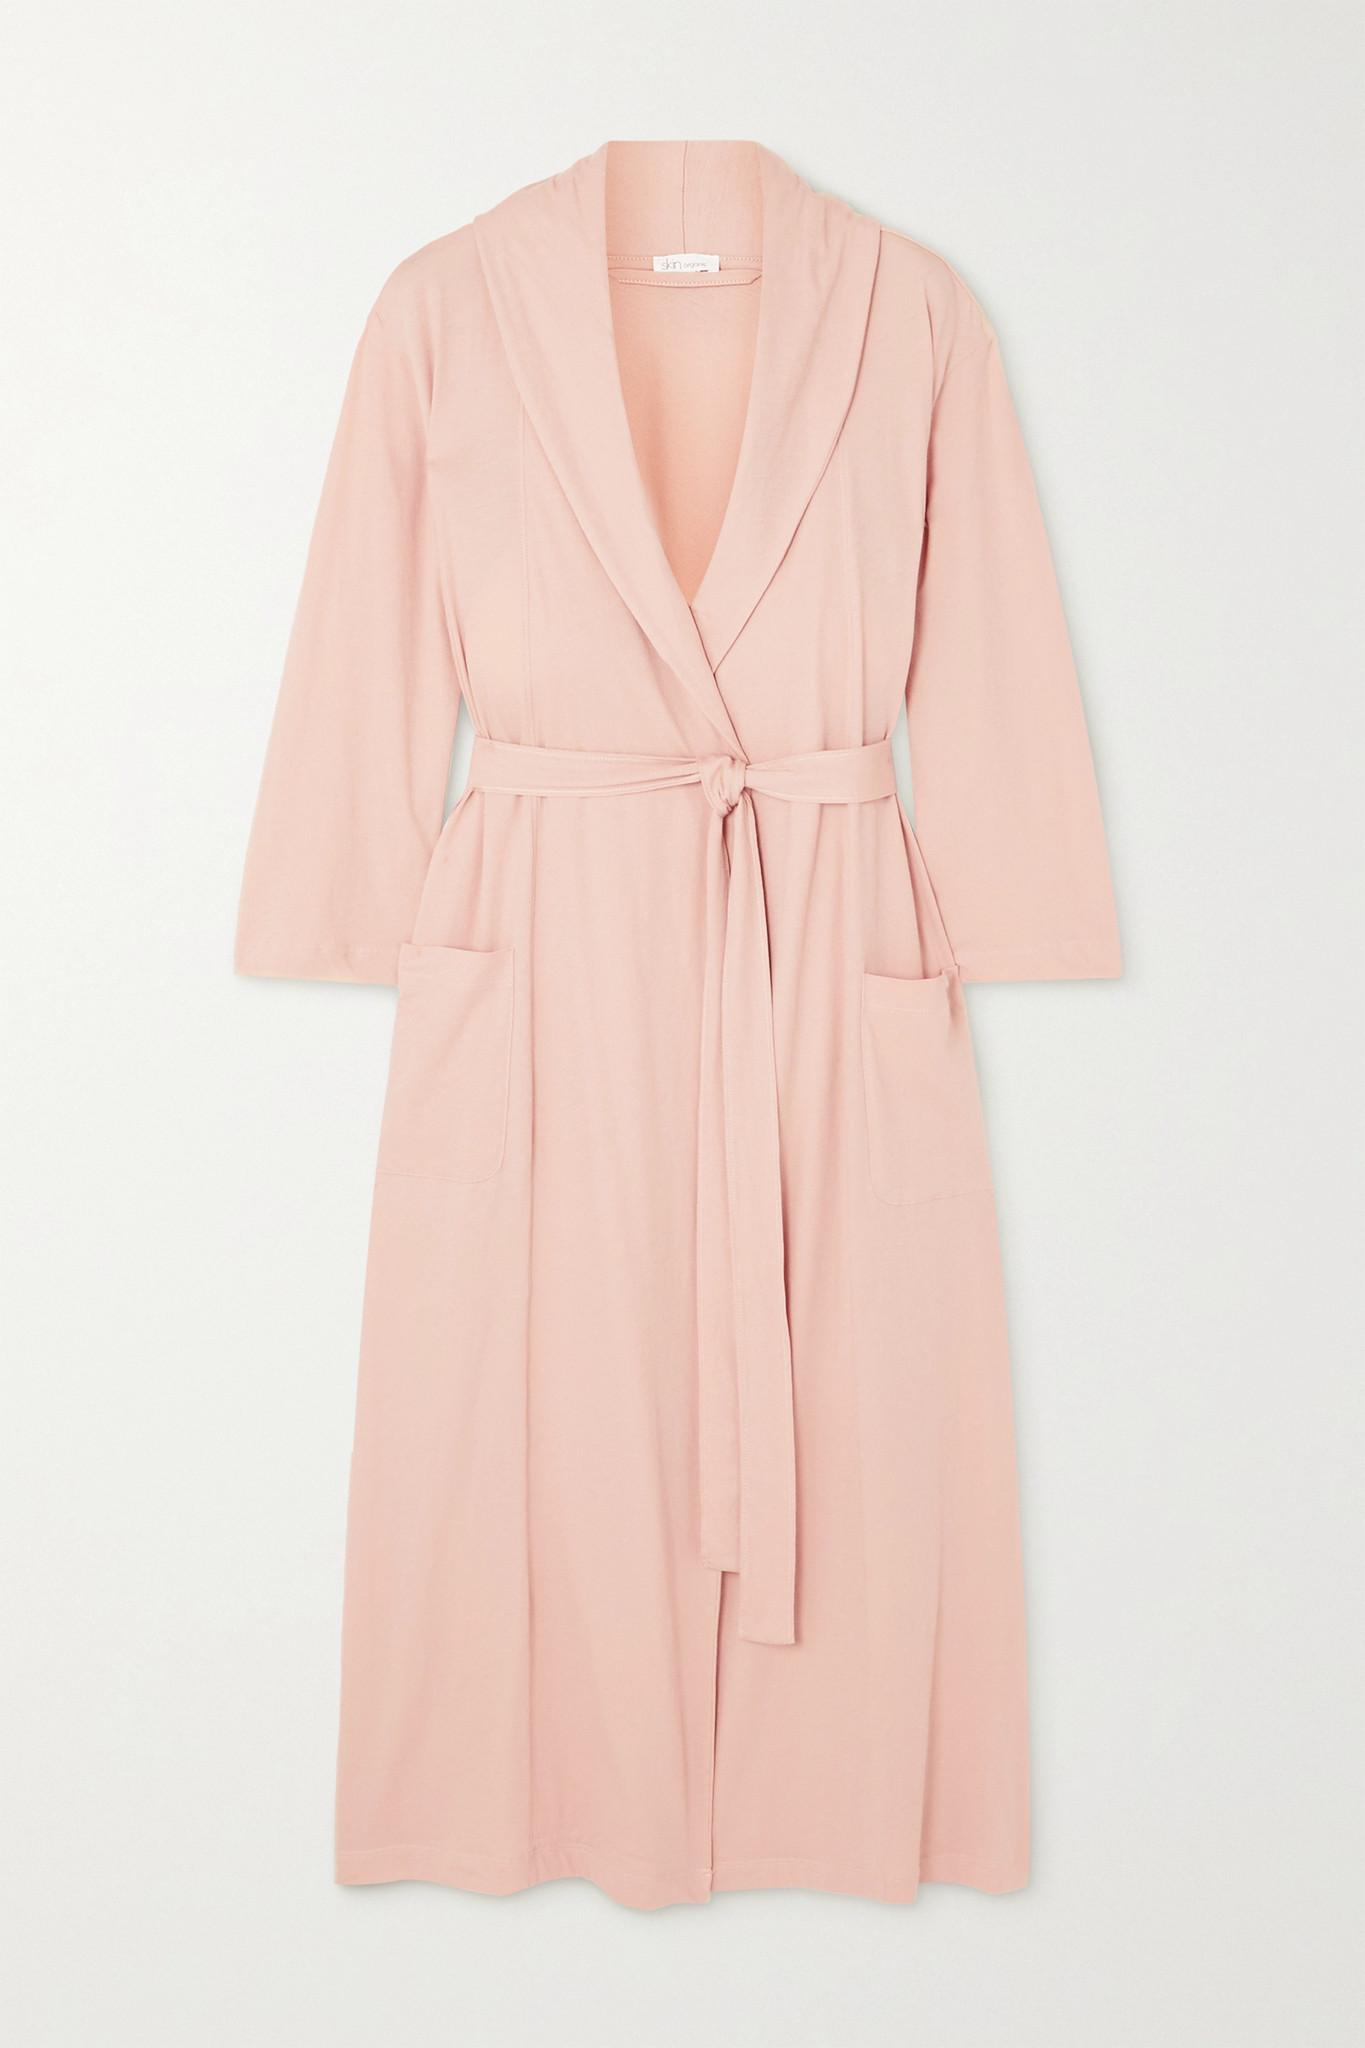 SKIN - + Net Sustain Carina Organic Pima Cotton-jersey Robe - Pink - 1